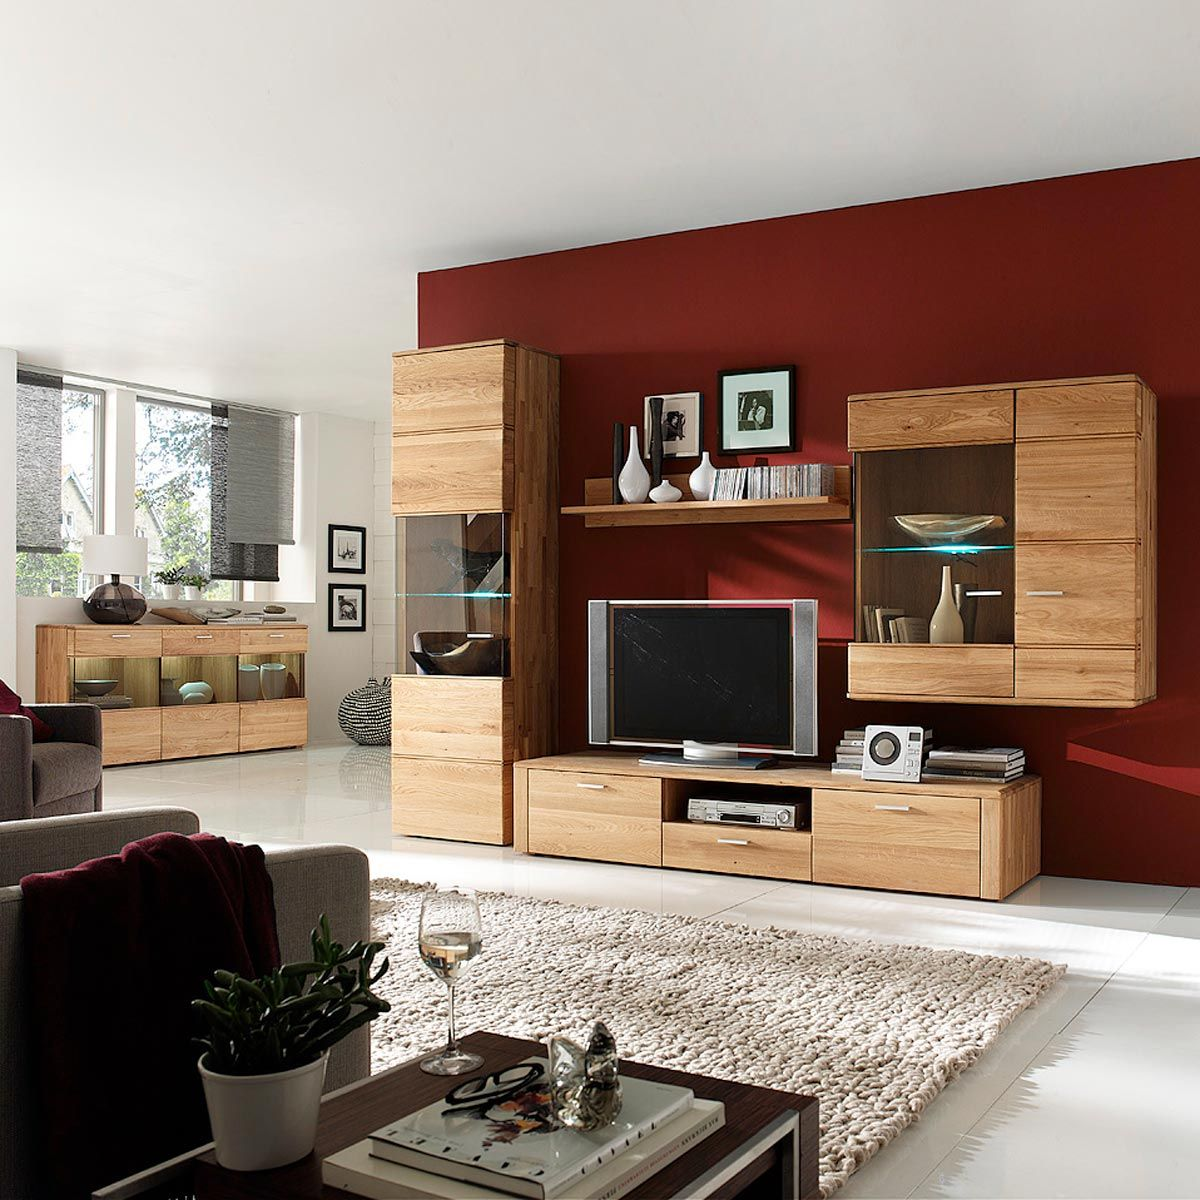 Massivholz Mobel Online Kaufen Mobel Wohnzimmer Online Mobel